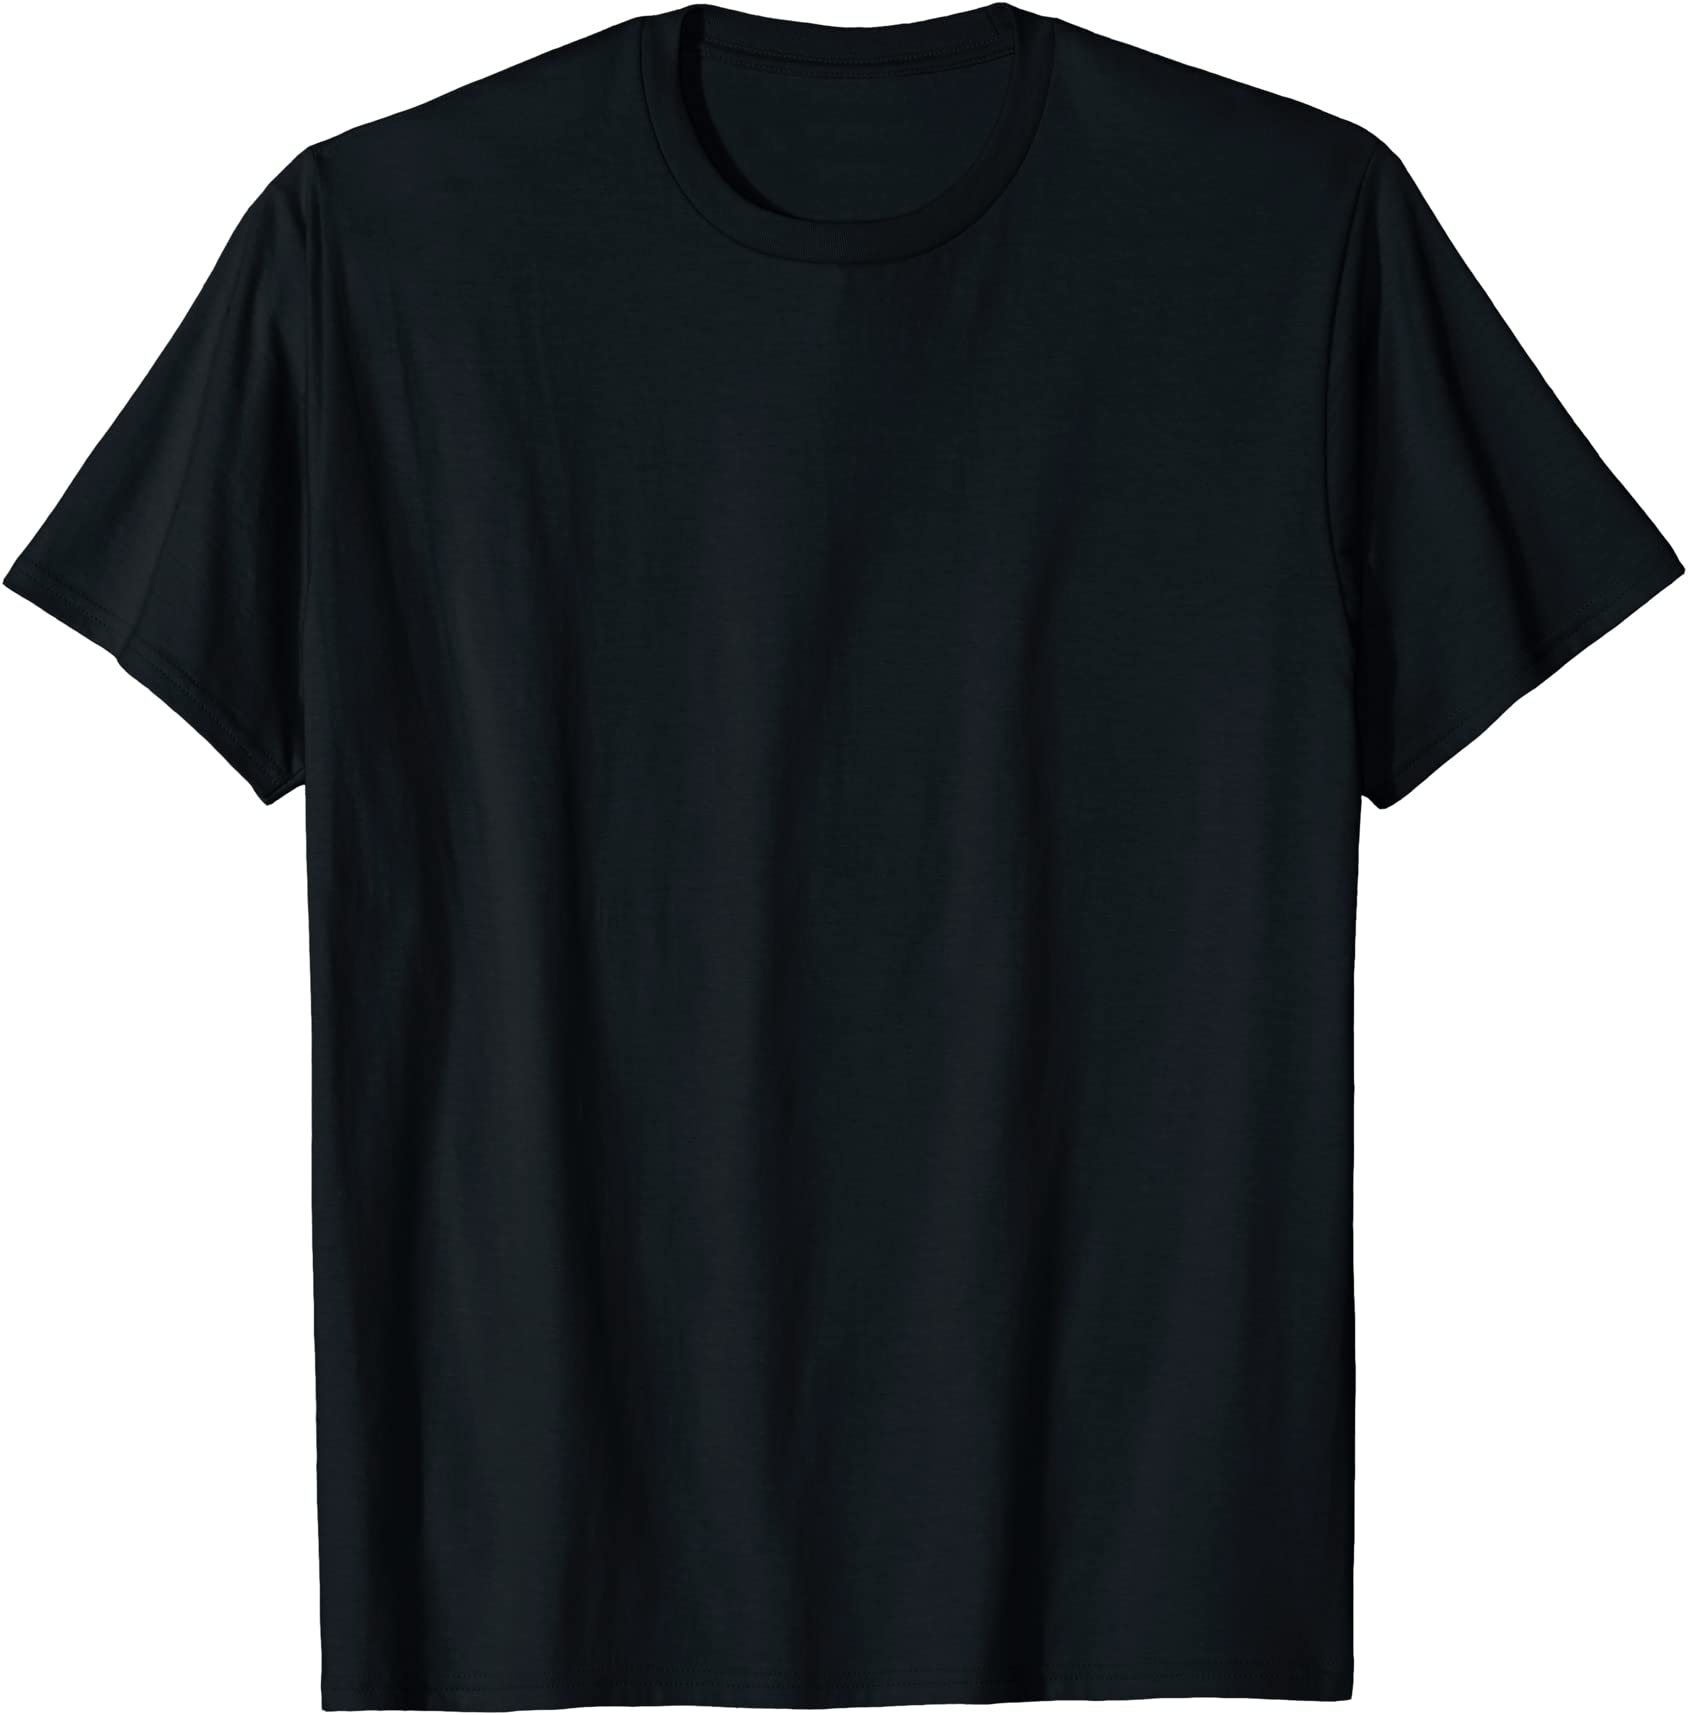 Ocelot Kid/'s T-Shirt Children Boys Girls Top